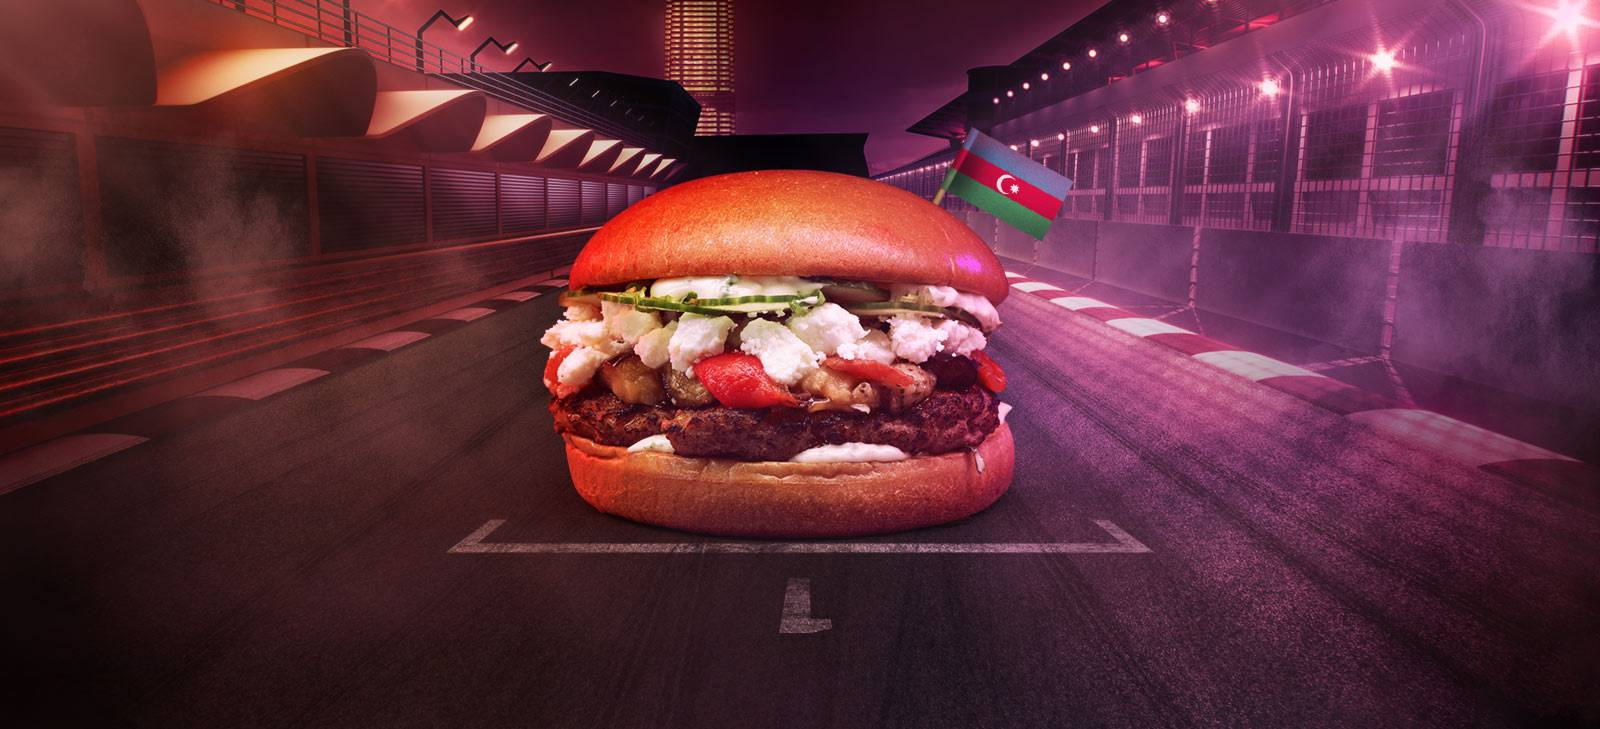 F1 Burgeri